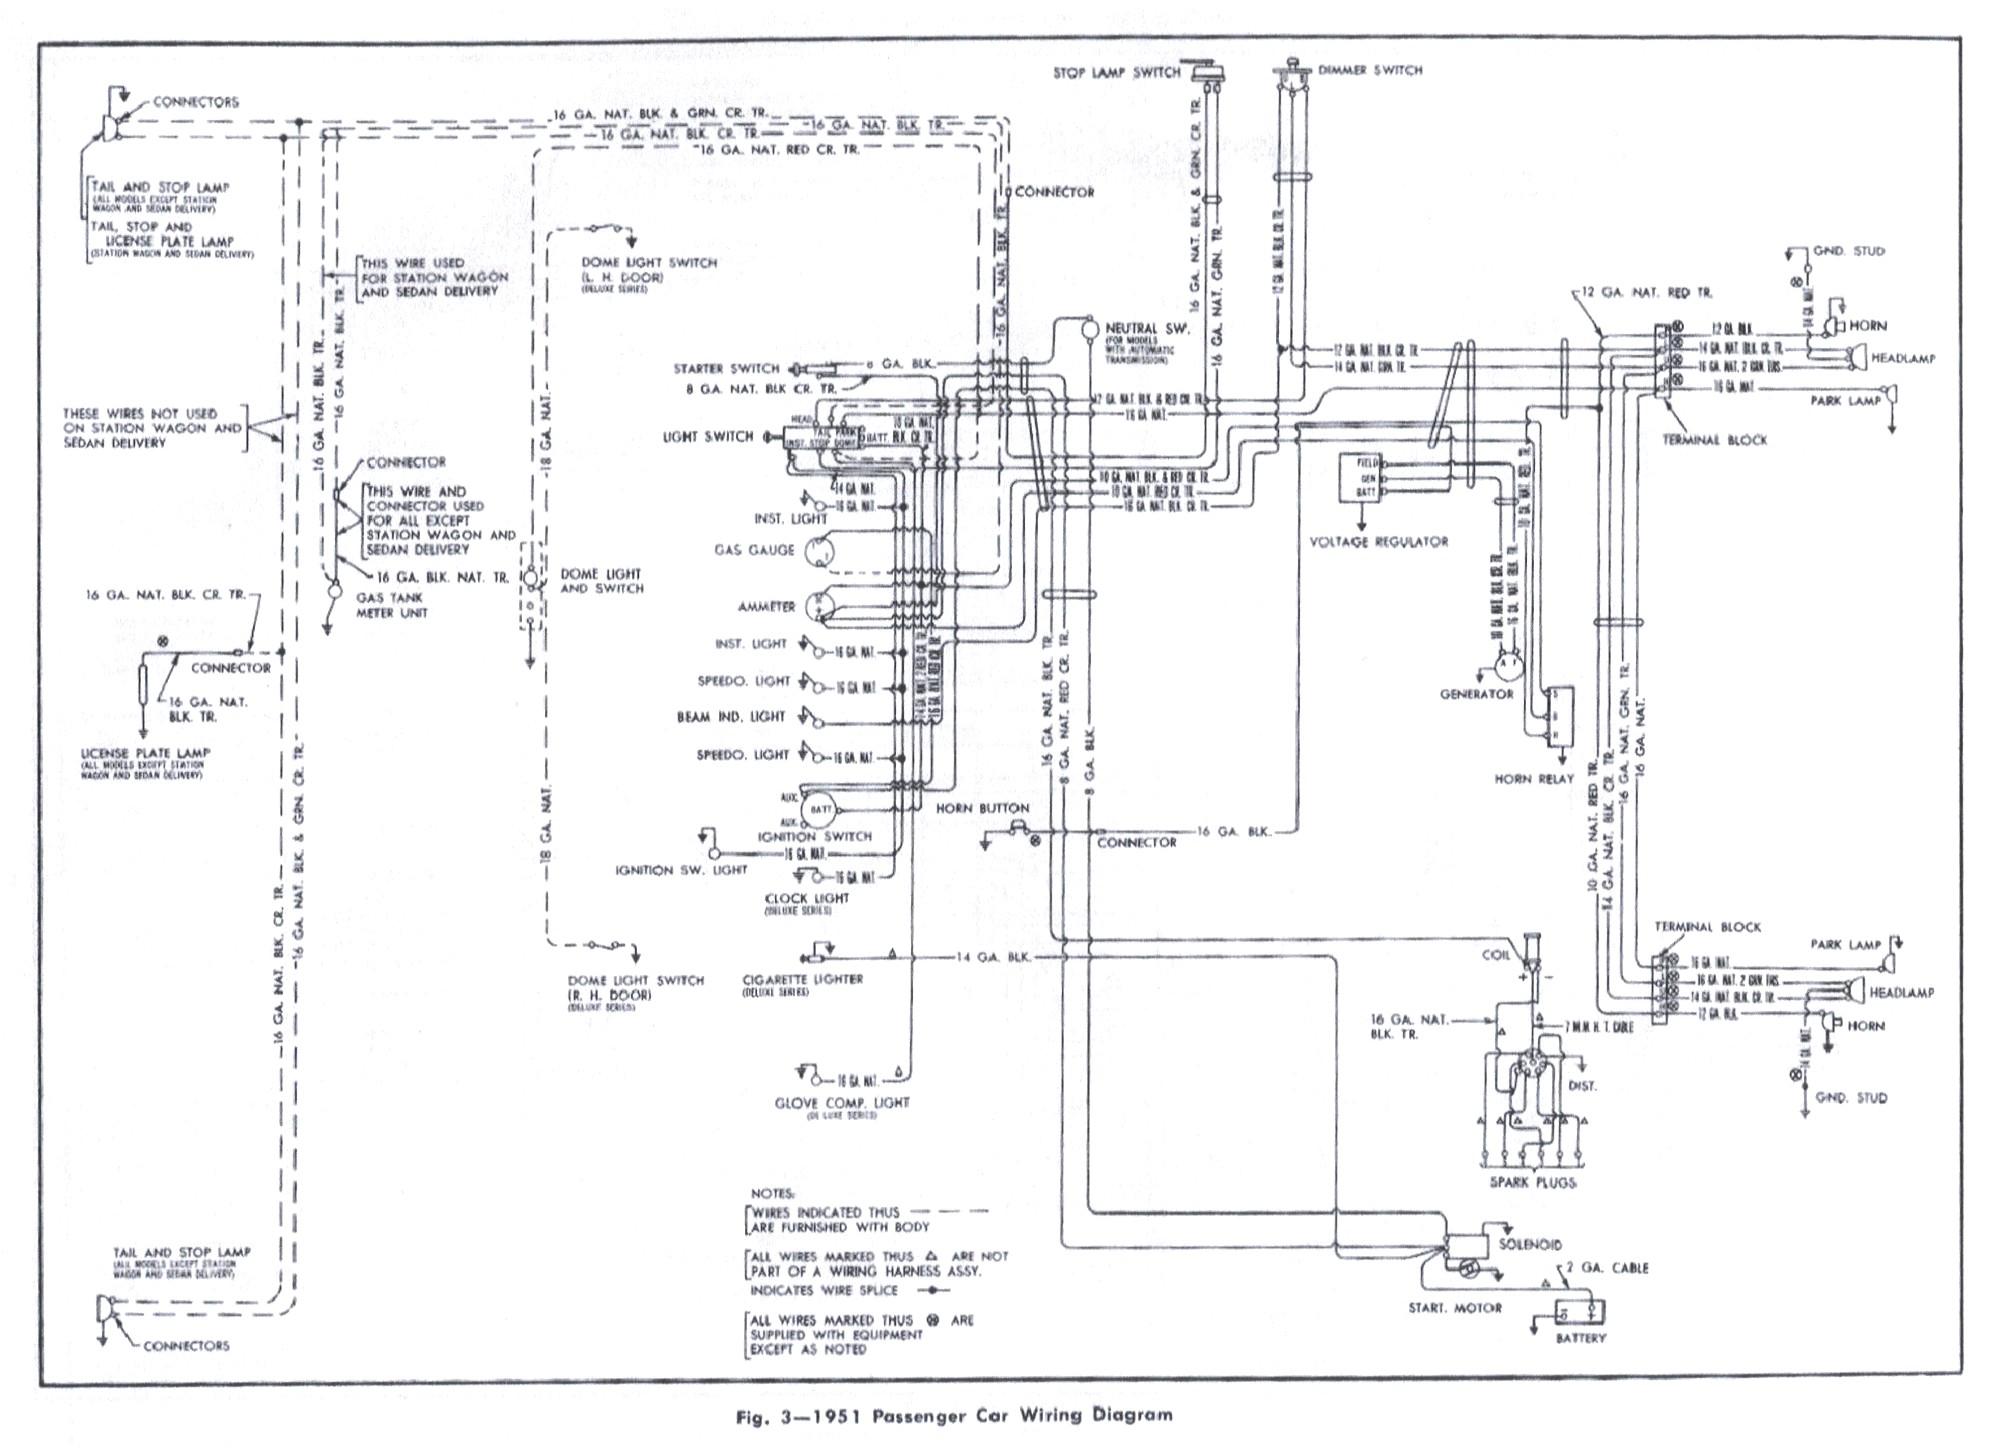 Fabulous 1951 Ford Ignition Wiring Diagram Diagram Data Schema Wiring Cloud Biosomenaidewilluminateatxorg